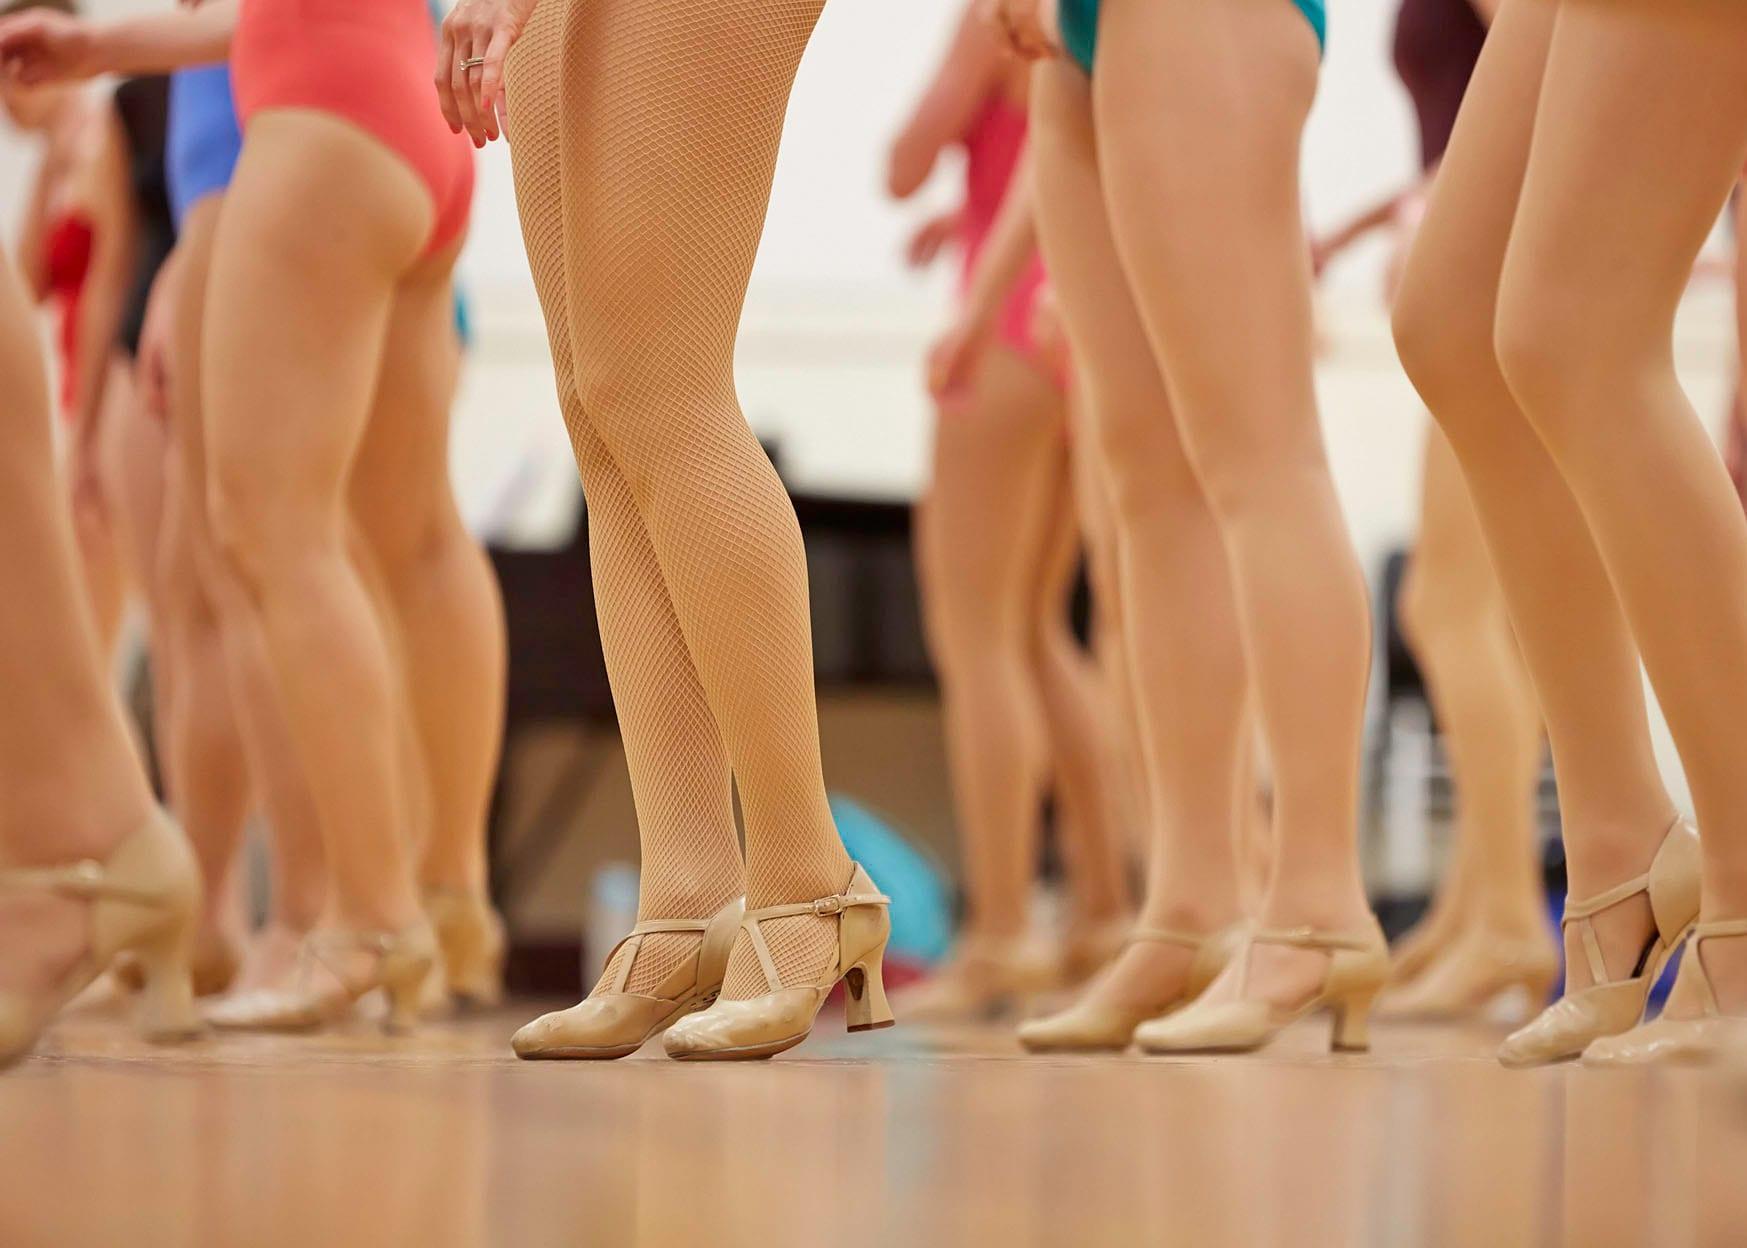 dance-tights-hacks-article